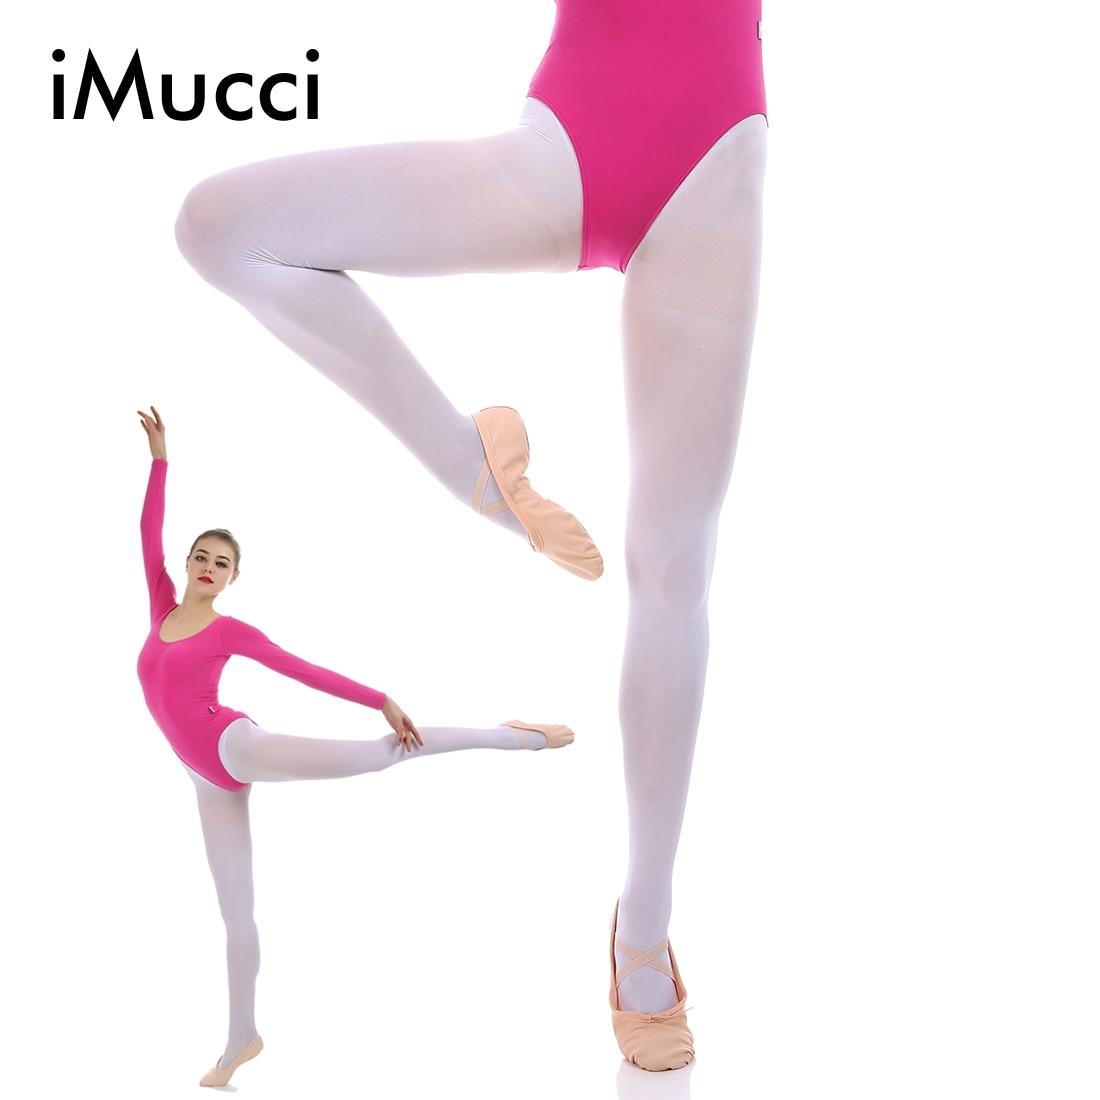 imucci-professional-font-b-ballet-b-font-dance-tights-full-foot-velvet-adult-women-convertible-sock-font-b-ballet-b-font-tights-dancing-ballerina-leggings